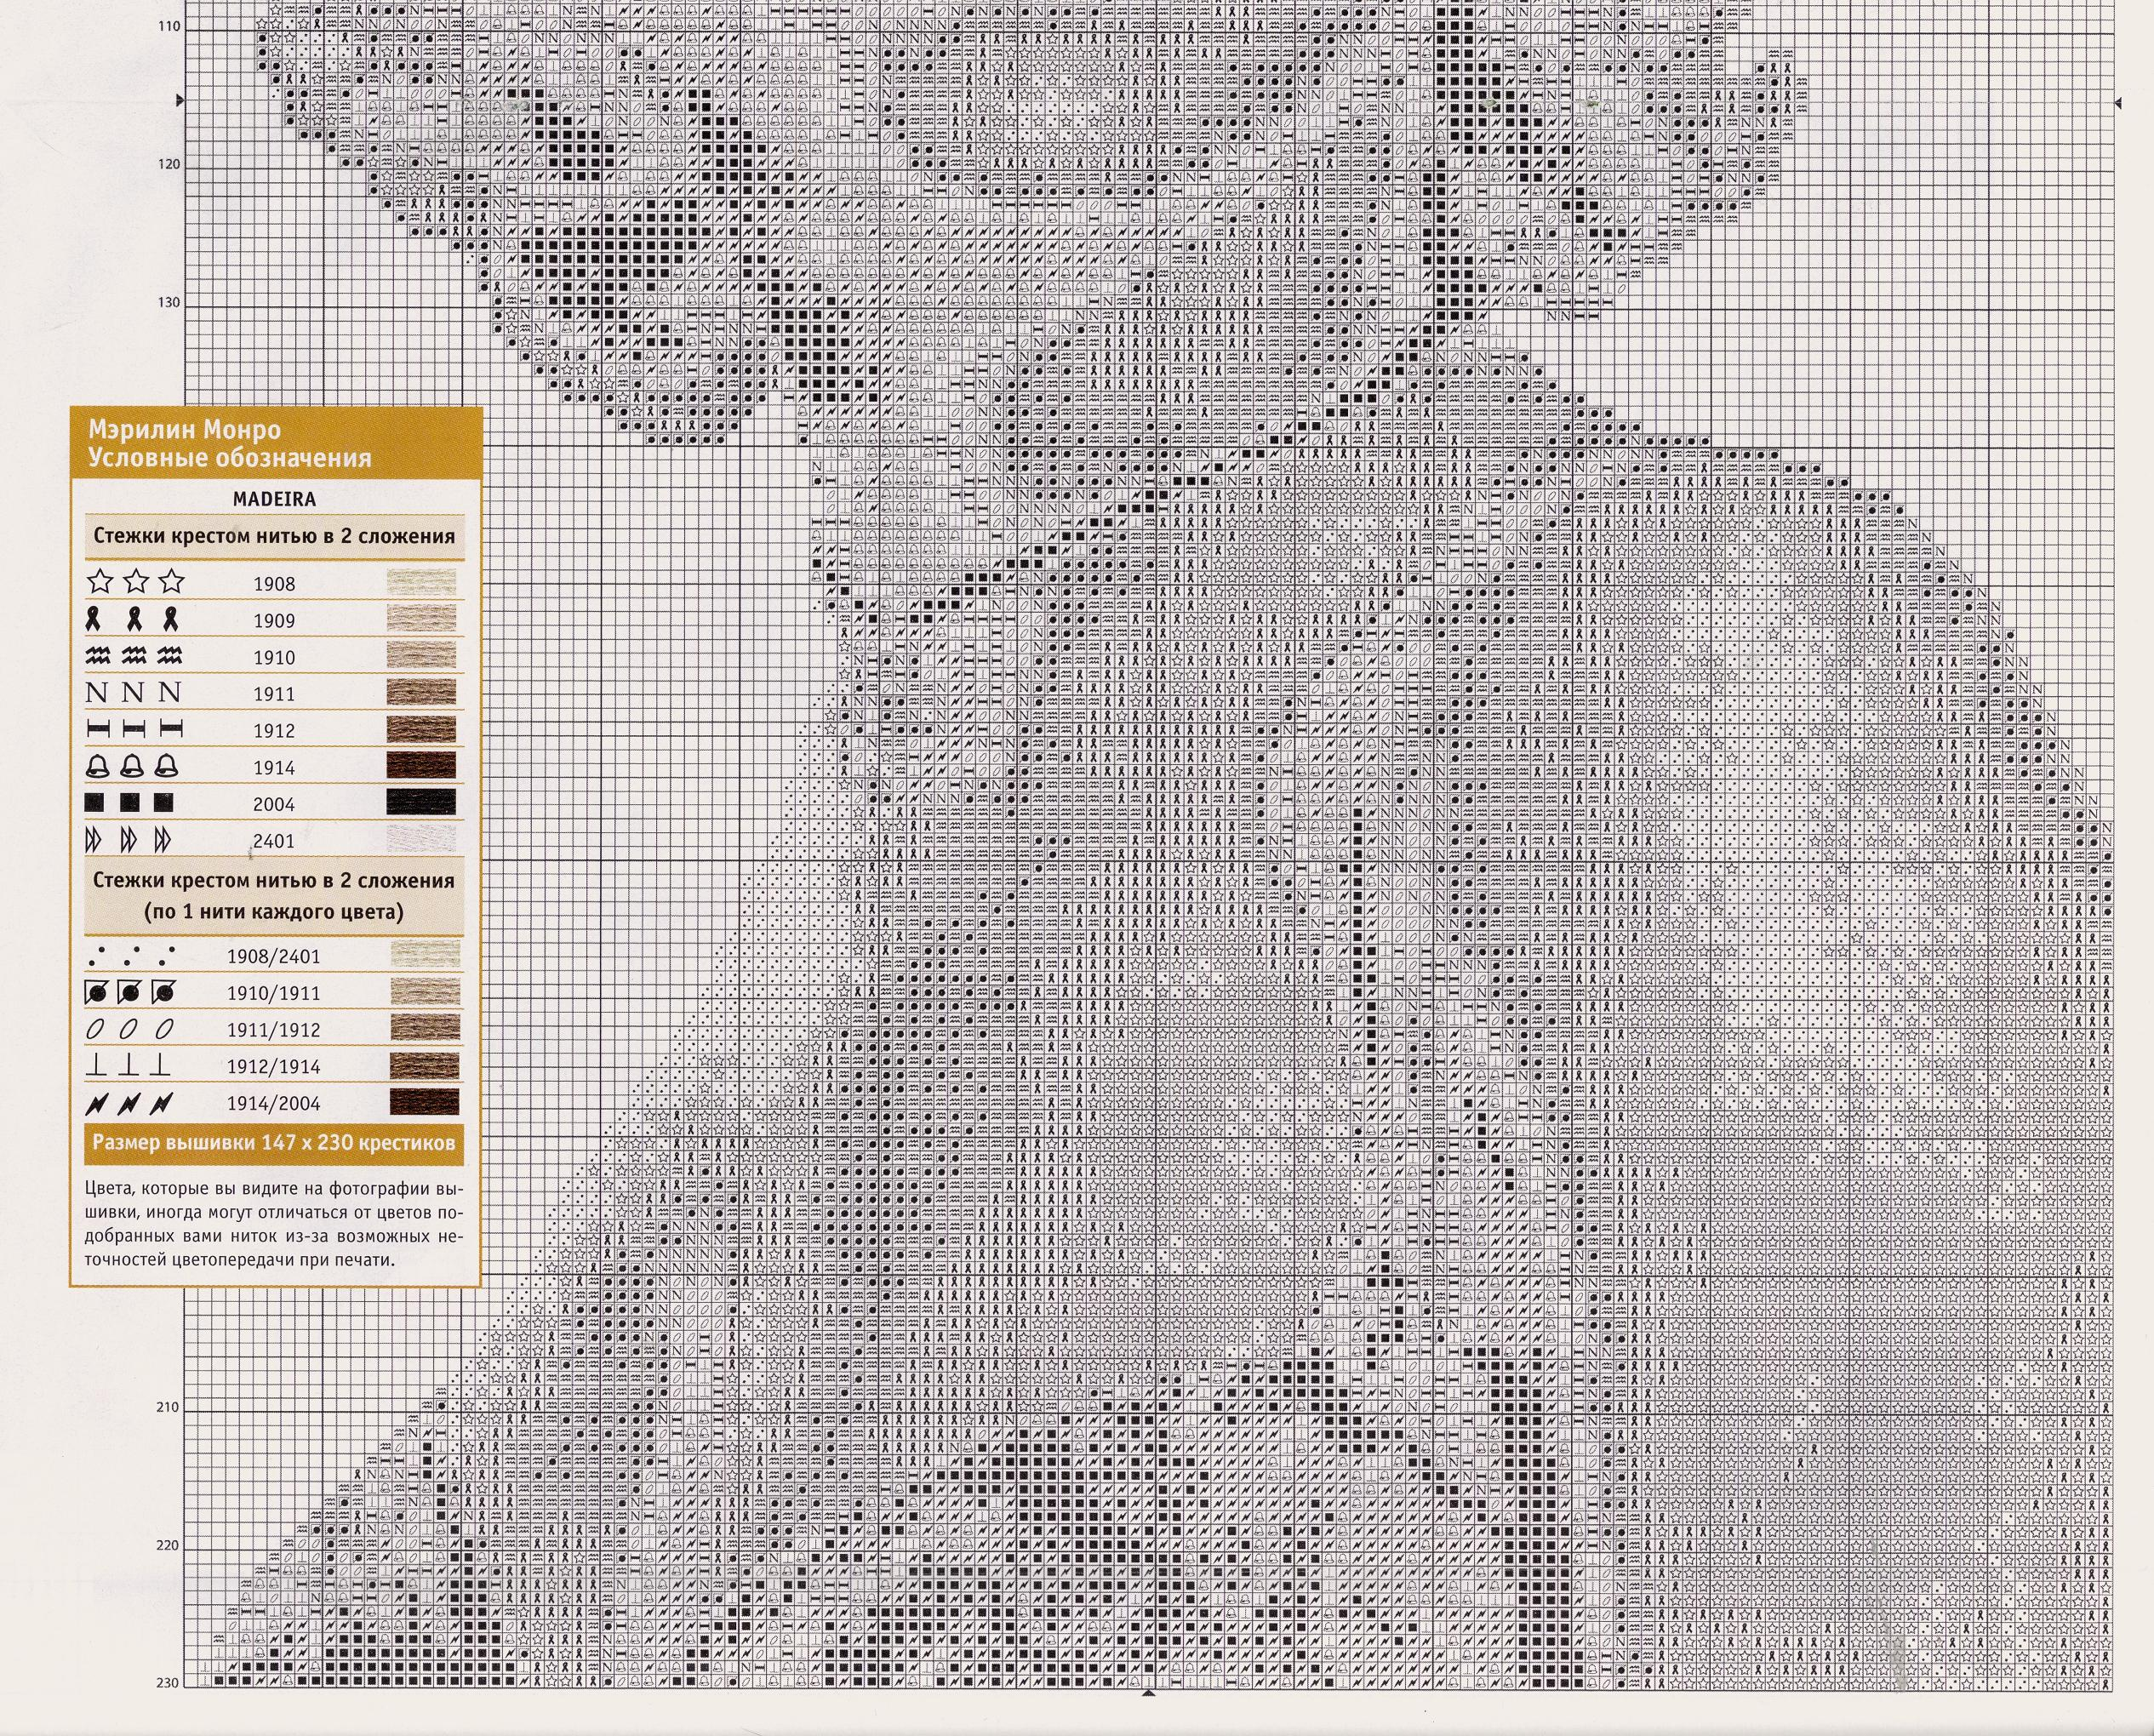 Схема вышивки мерлин монро крестом